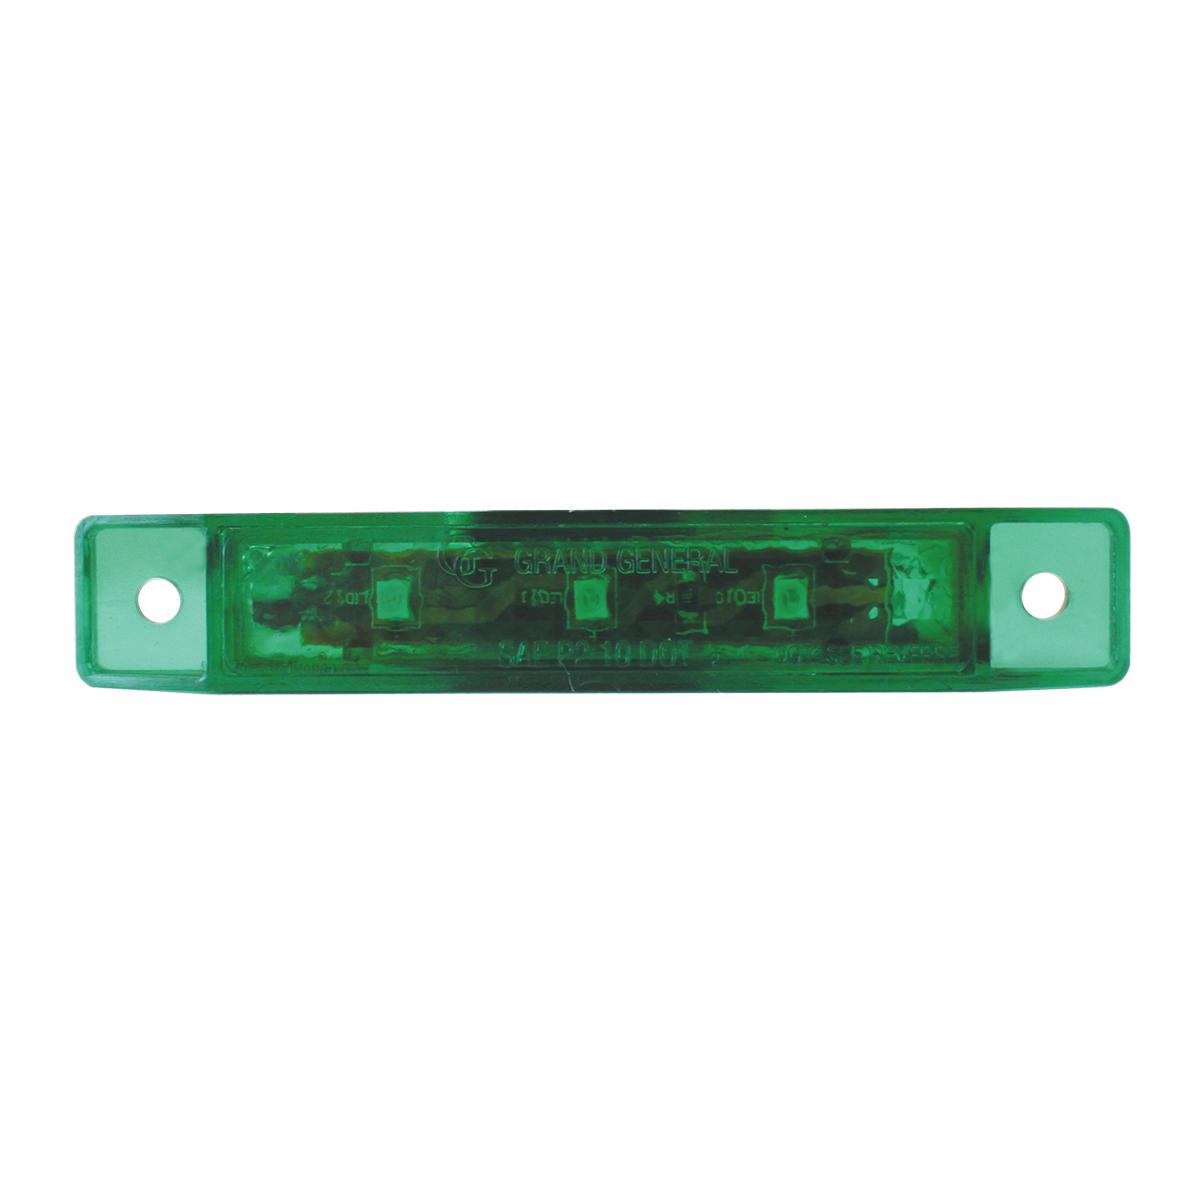 "76286 3.5"" Ultra Thin LED Marker Light"